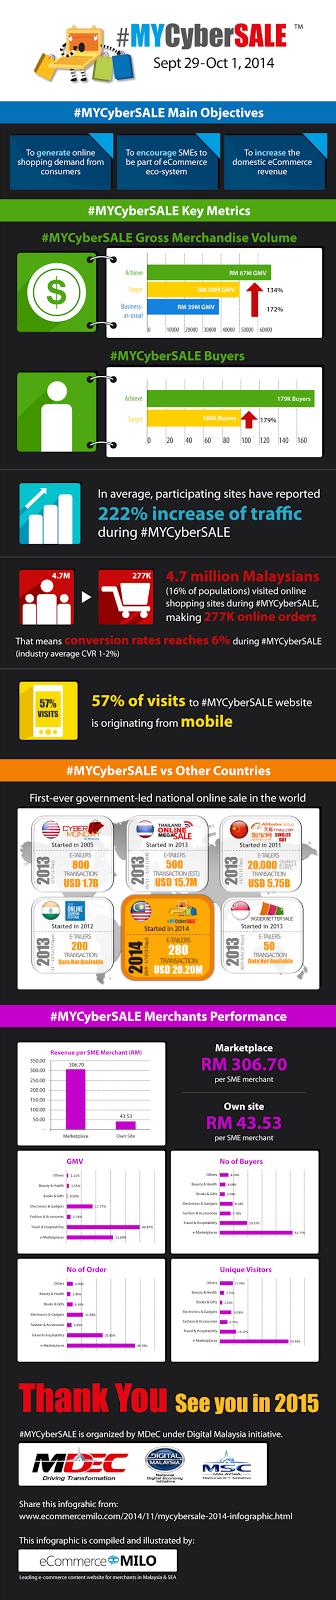 #MYCyberSALE 2014 infographic